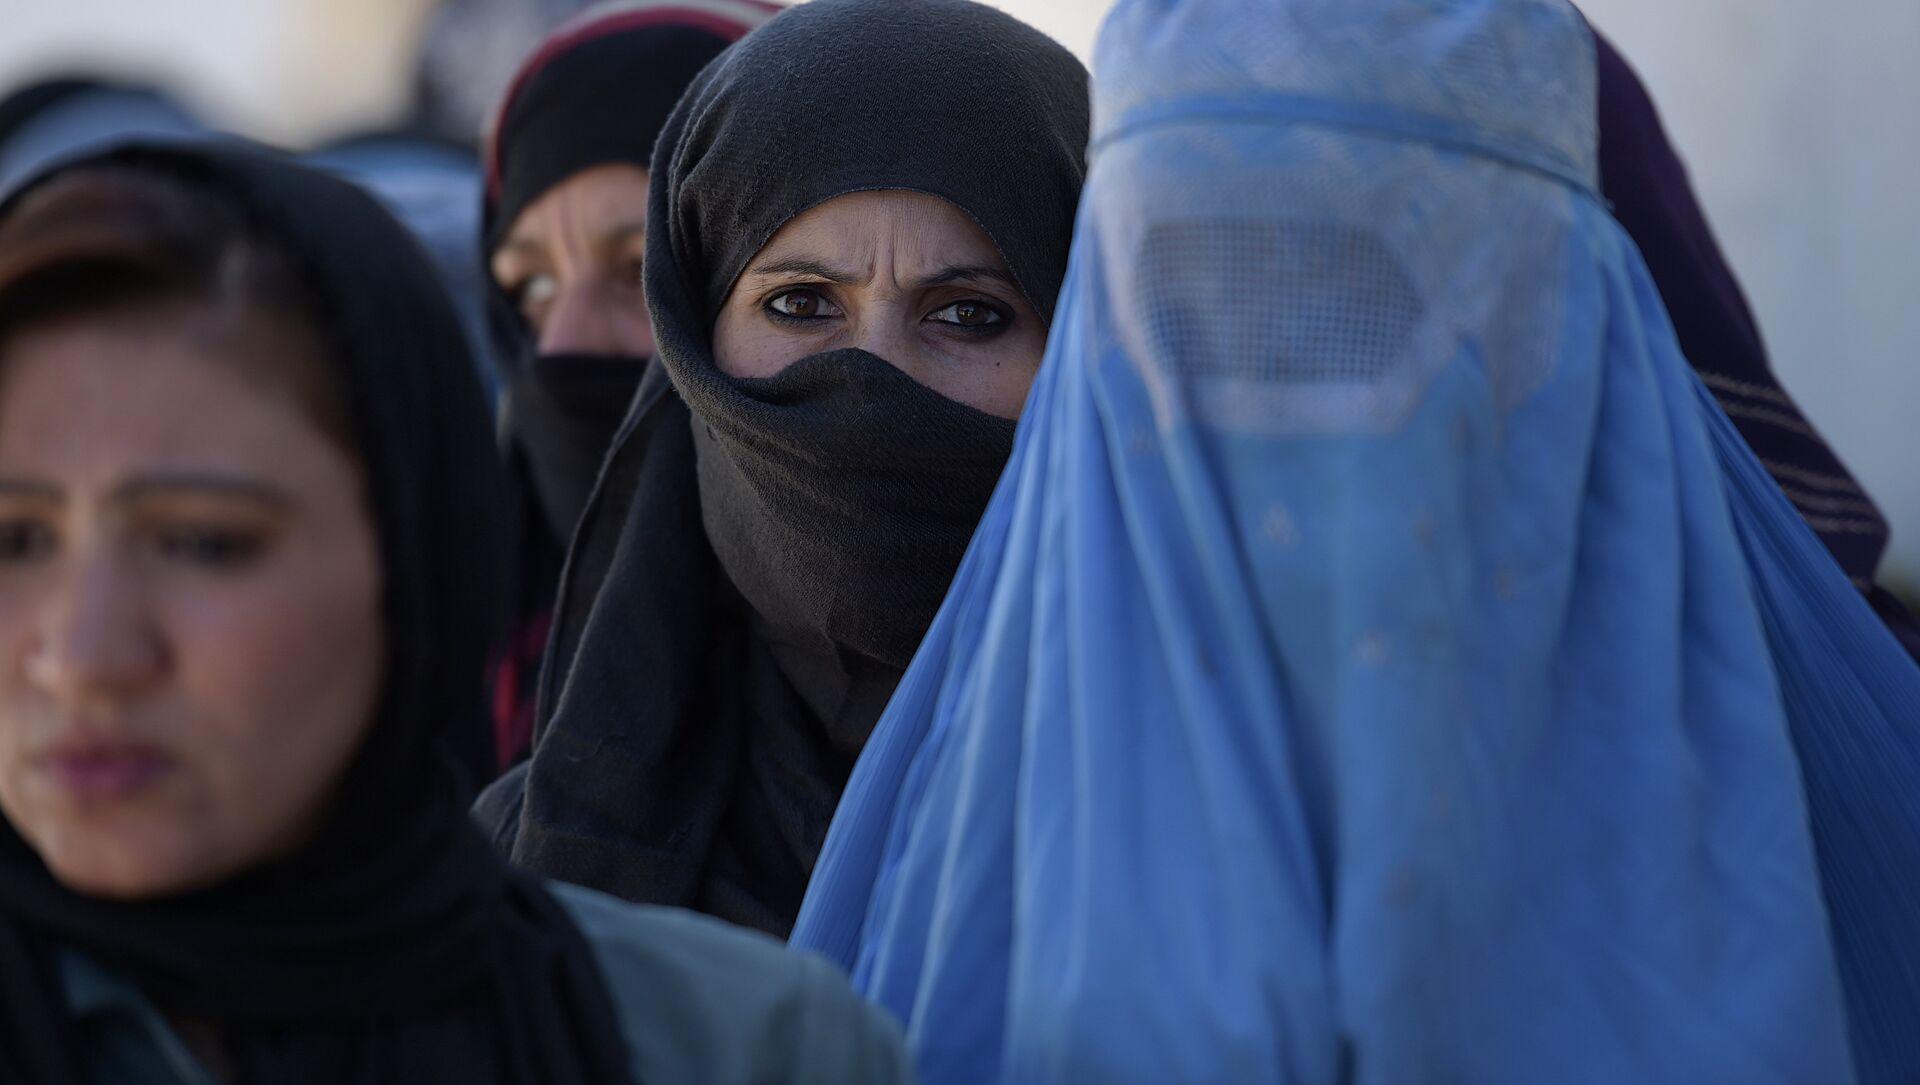 Phụ nữ Afghanistan ở Kabul - Sputnik Việt Nam, 1920, 20.09.2021